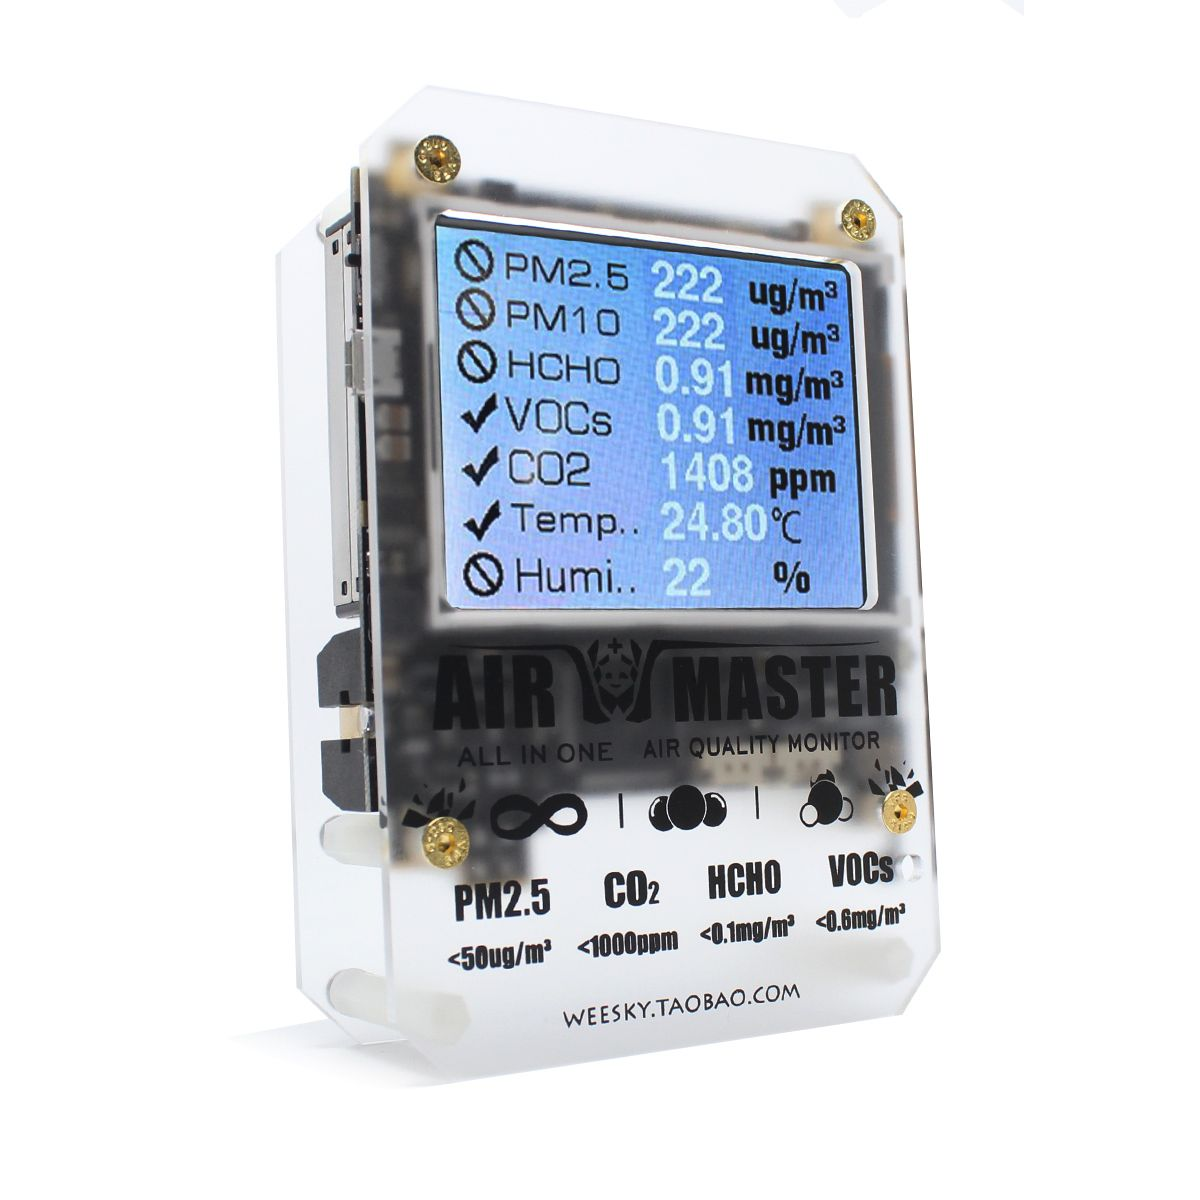 Air Master AM7 Plus Gas Sensor Home PM2 Tester Detector DART Formaldehyde 2-FE5 VOC Sensirion 0053 CO2 Open Source